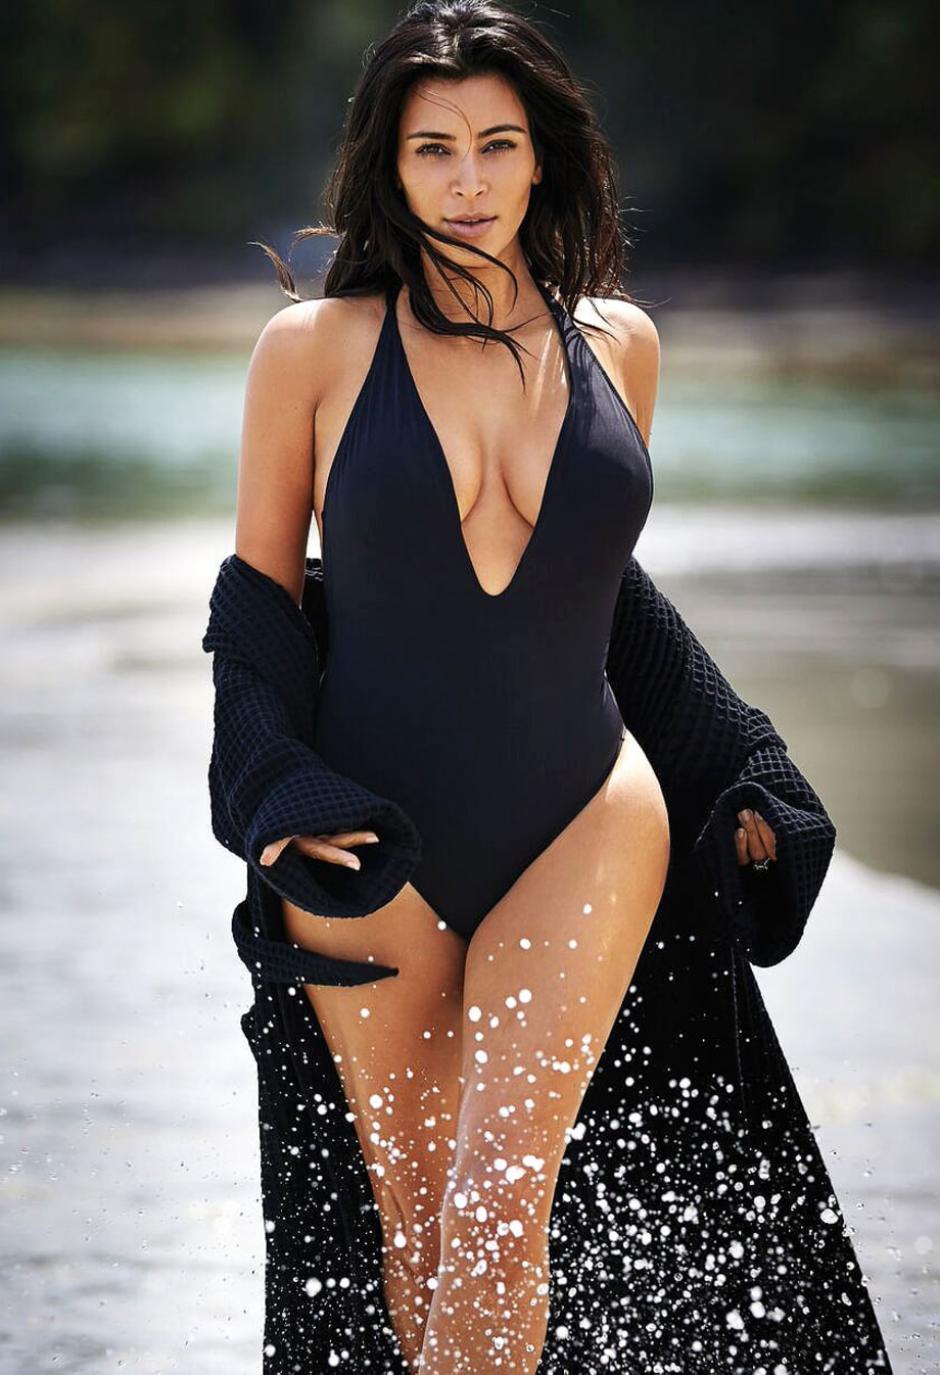 La celebridad sorprende por sus curvas. (Foto: usmagazine)